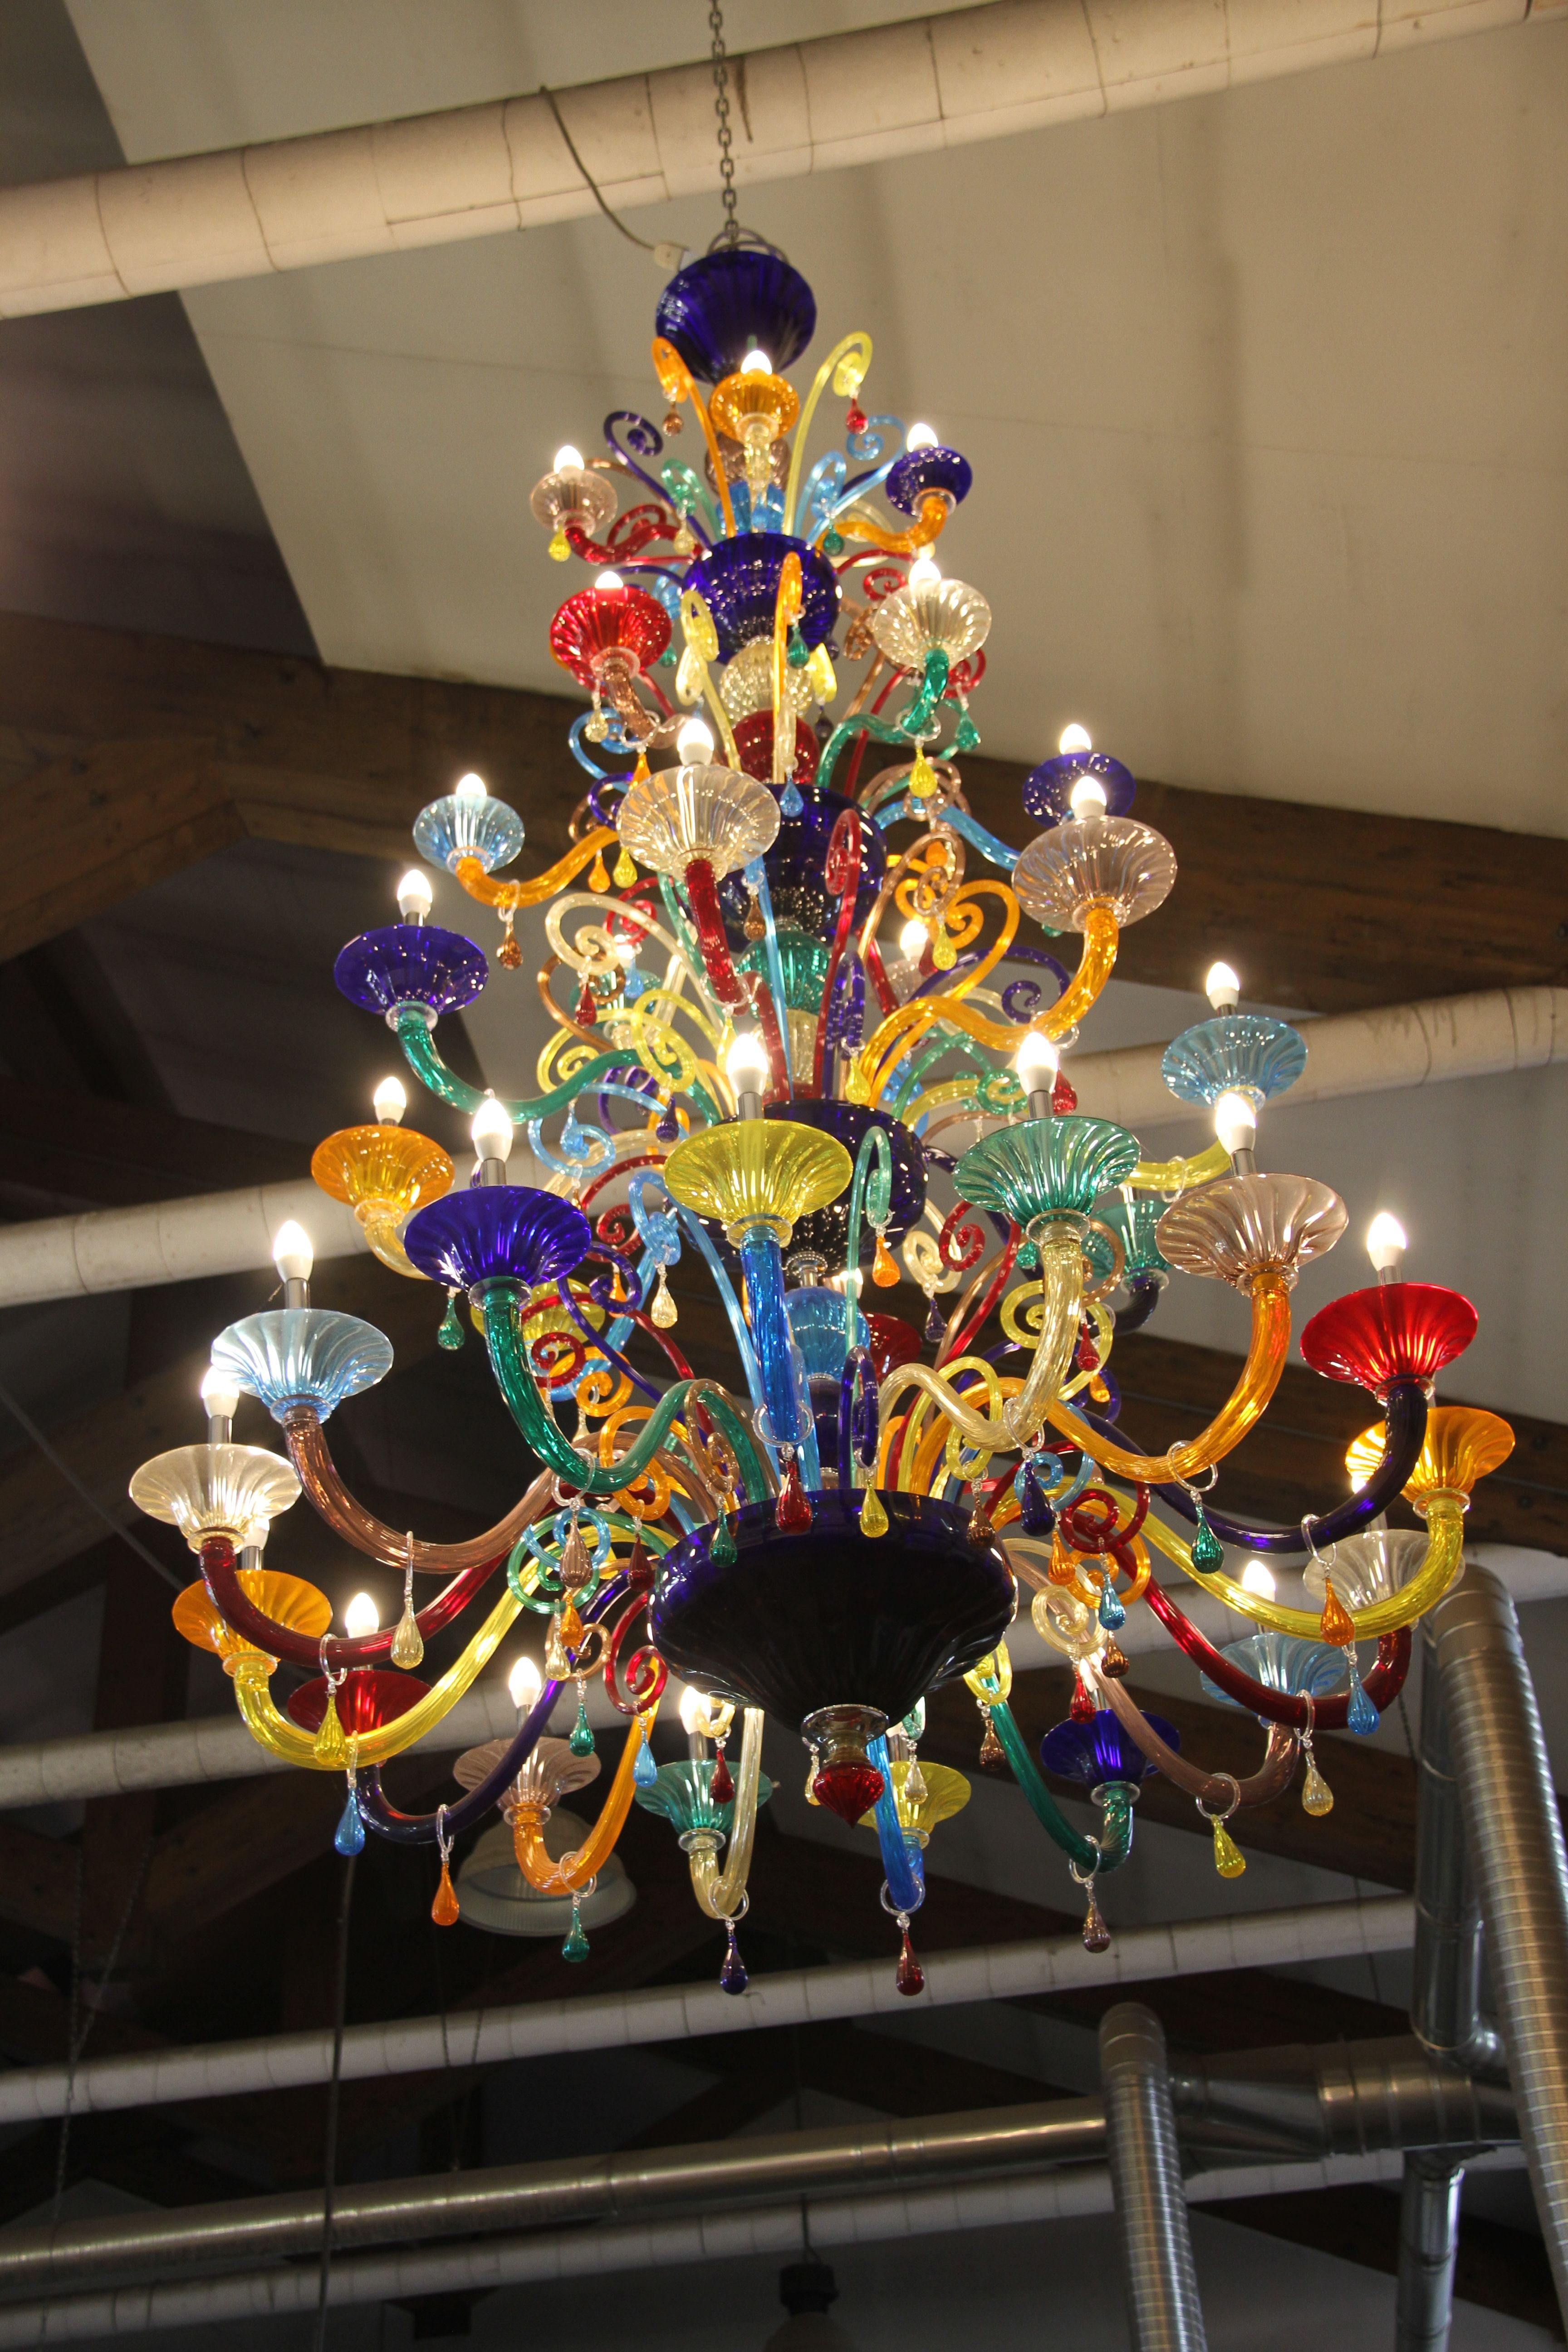 A Shot Of Murano Glass Chandelier From Tadashi S Trip To The Island Escape Venice With Shoji